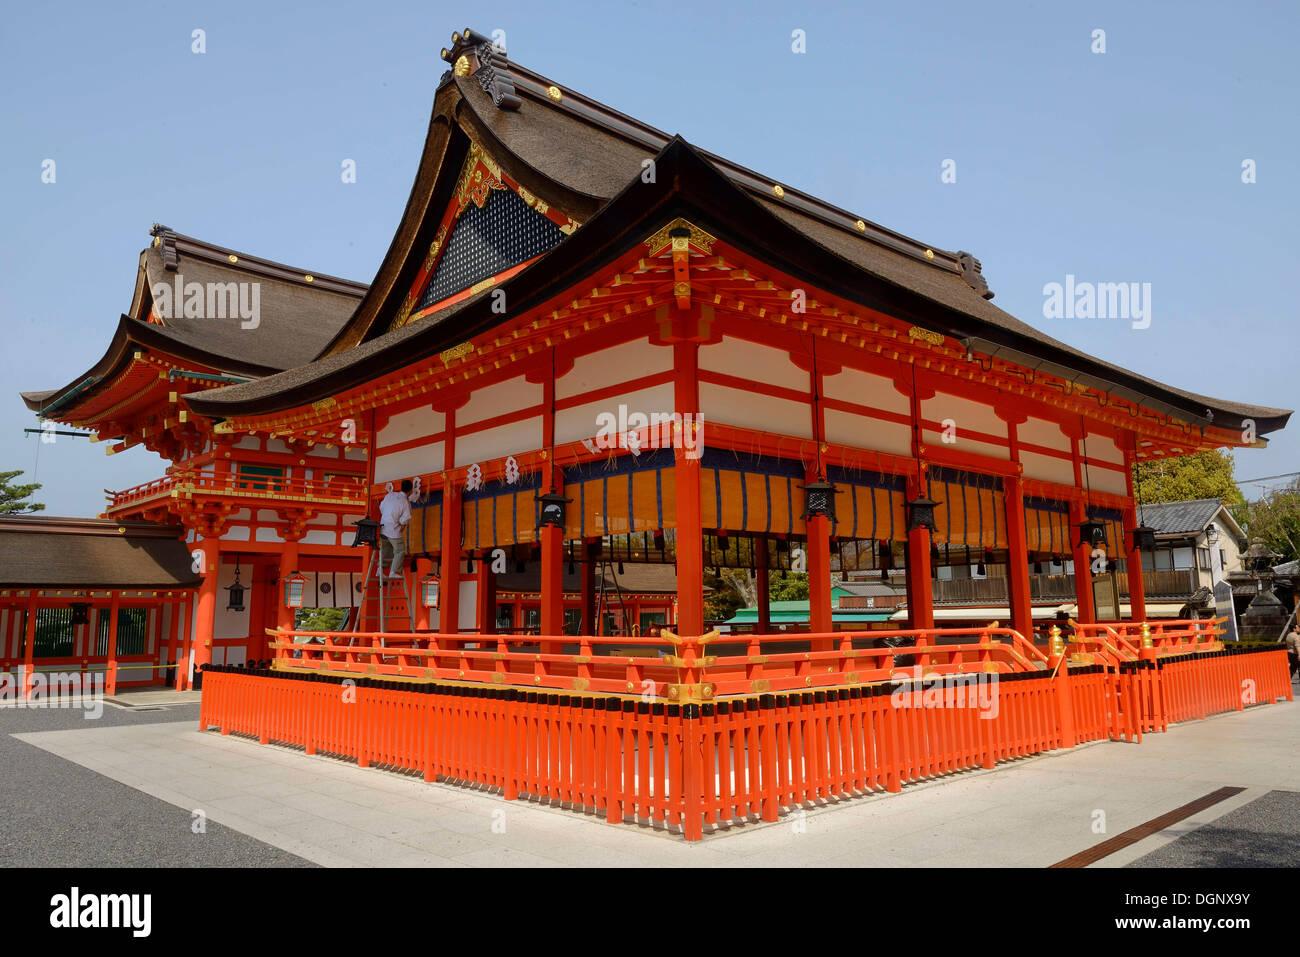 Fushimi Inari Taisha or Oinari-san Shinto shrine, Fushimi, Kyoto, Kinki region, Japan - Stock Image